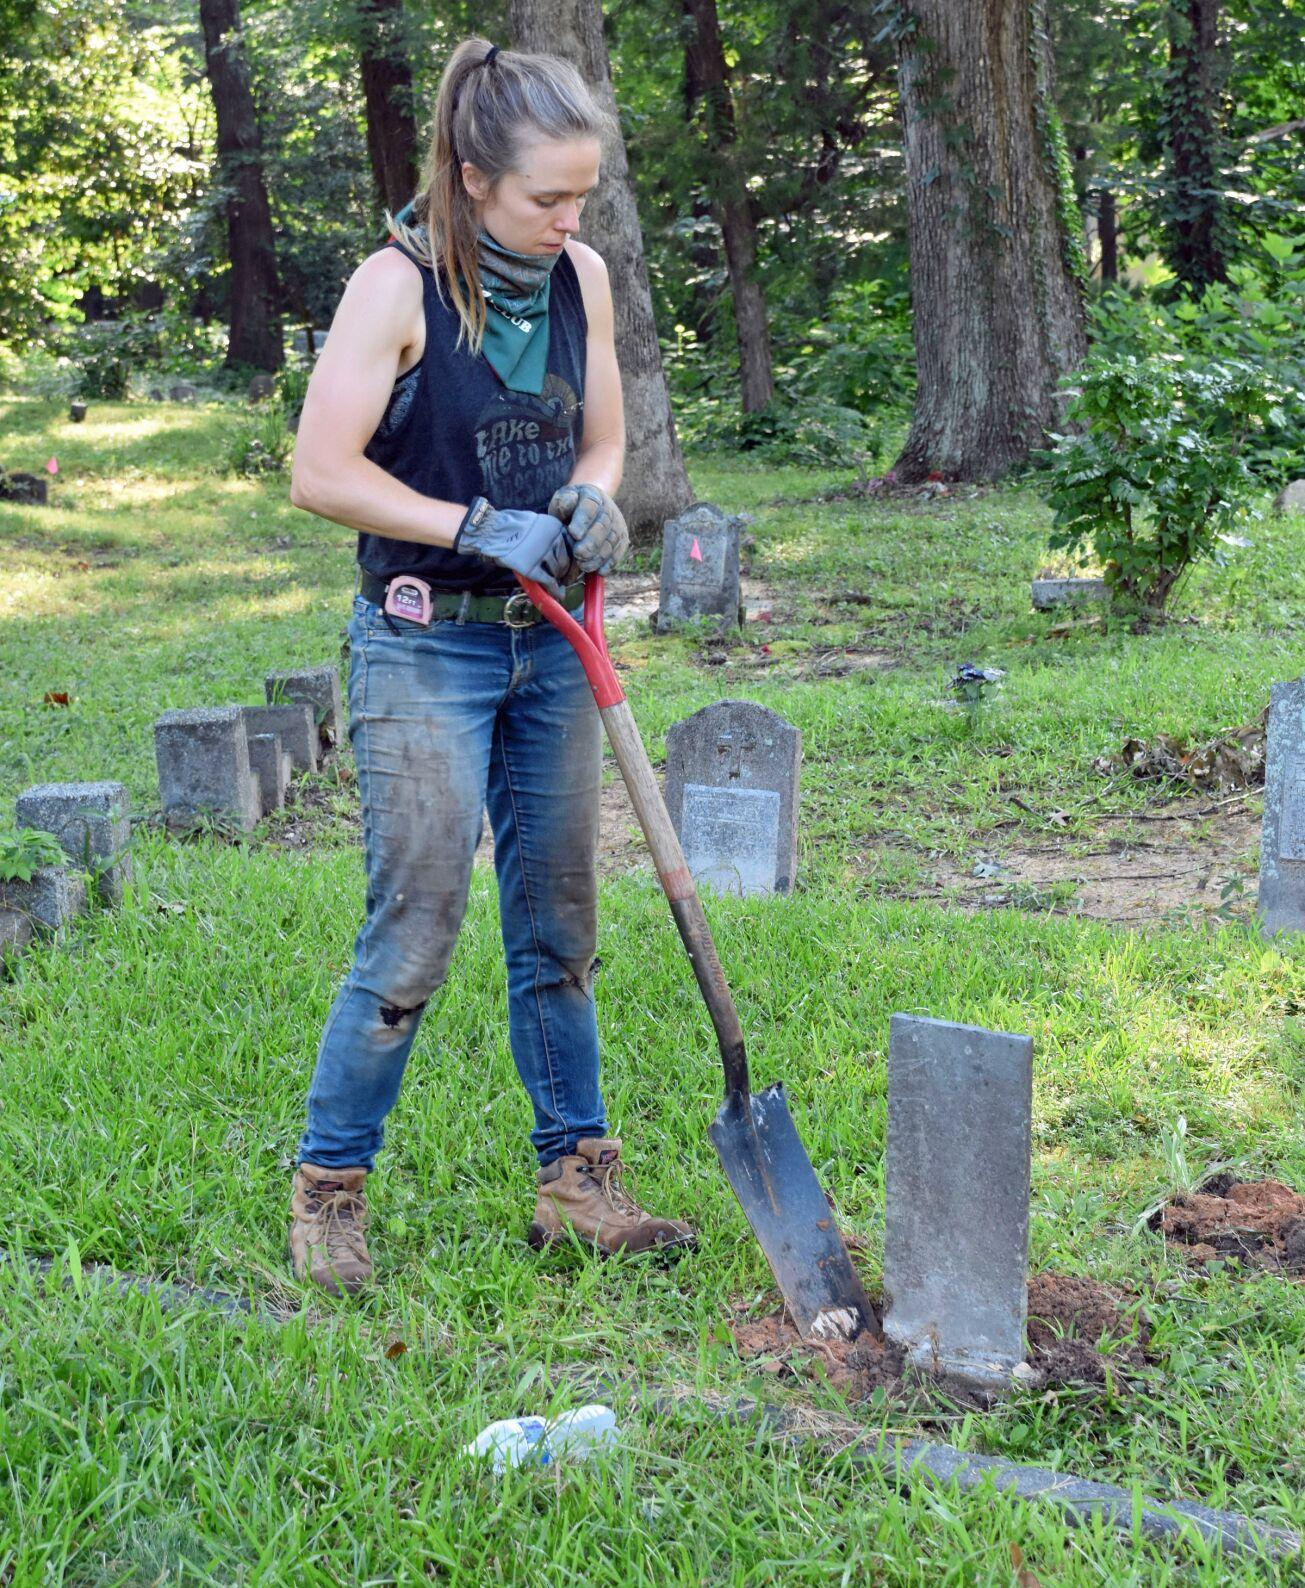 090920_MNS_full_BHS_cemetery_001 Ashley Shares